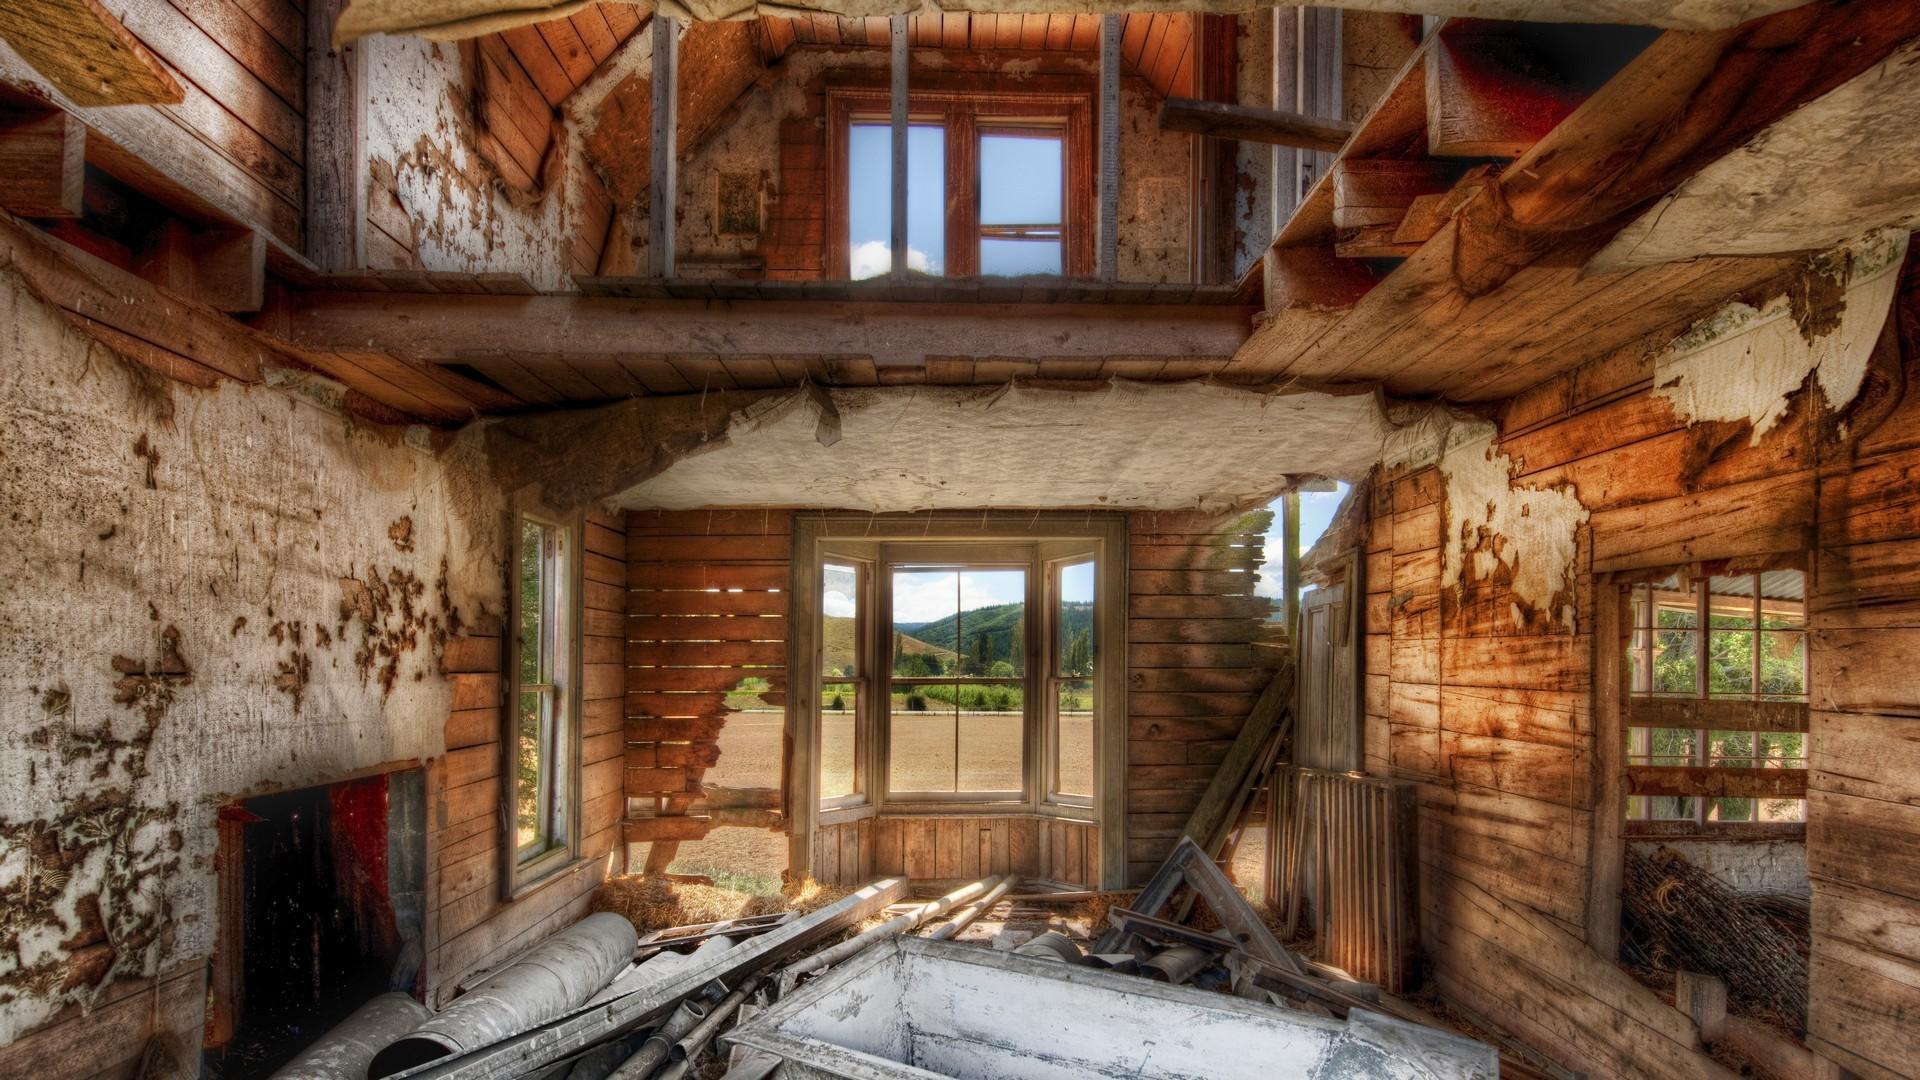 Wallpaper Window Room Wood House Indoors HDR